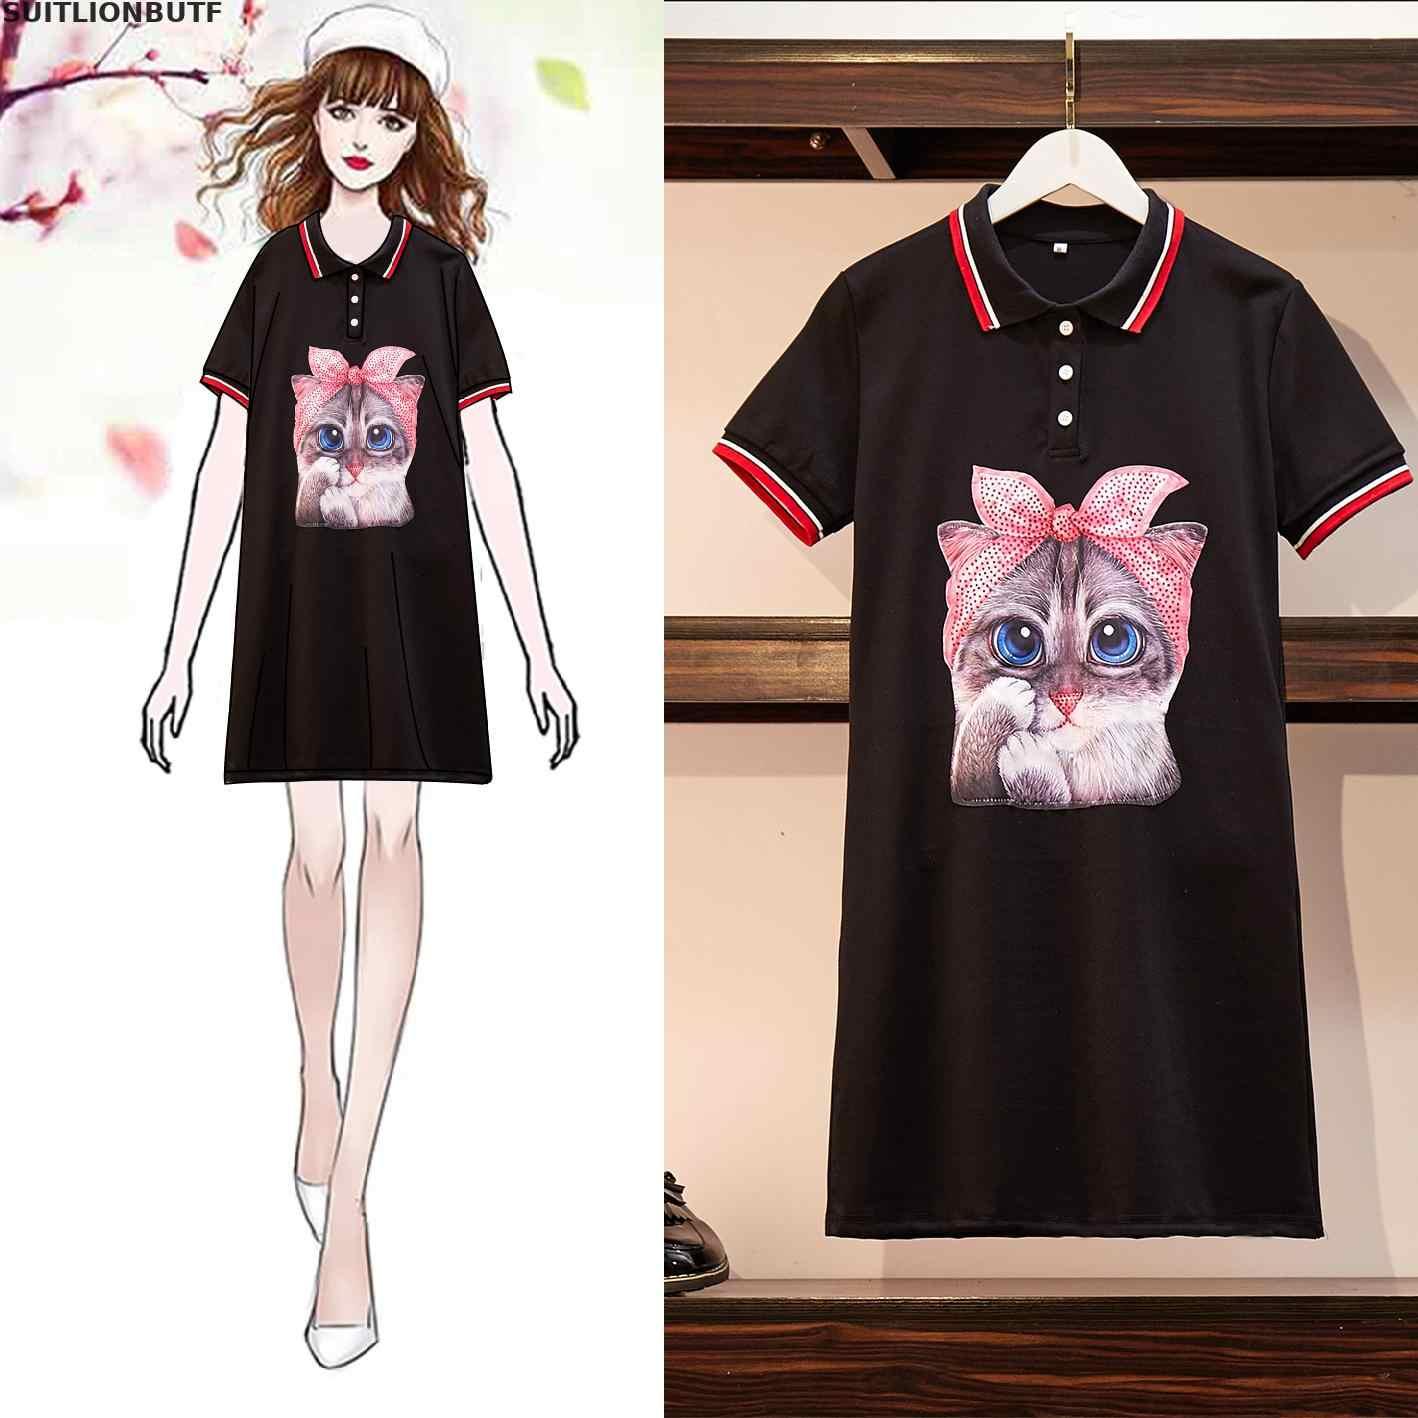 Suitlionbutf Women Summer Dress Cartoon Cat Hot Drilling Print Dresses Turn-down Collar Straight Dresses OL Women Dress